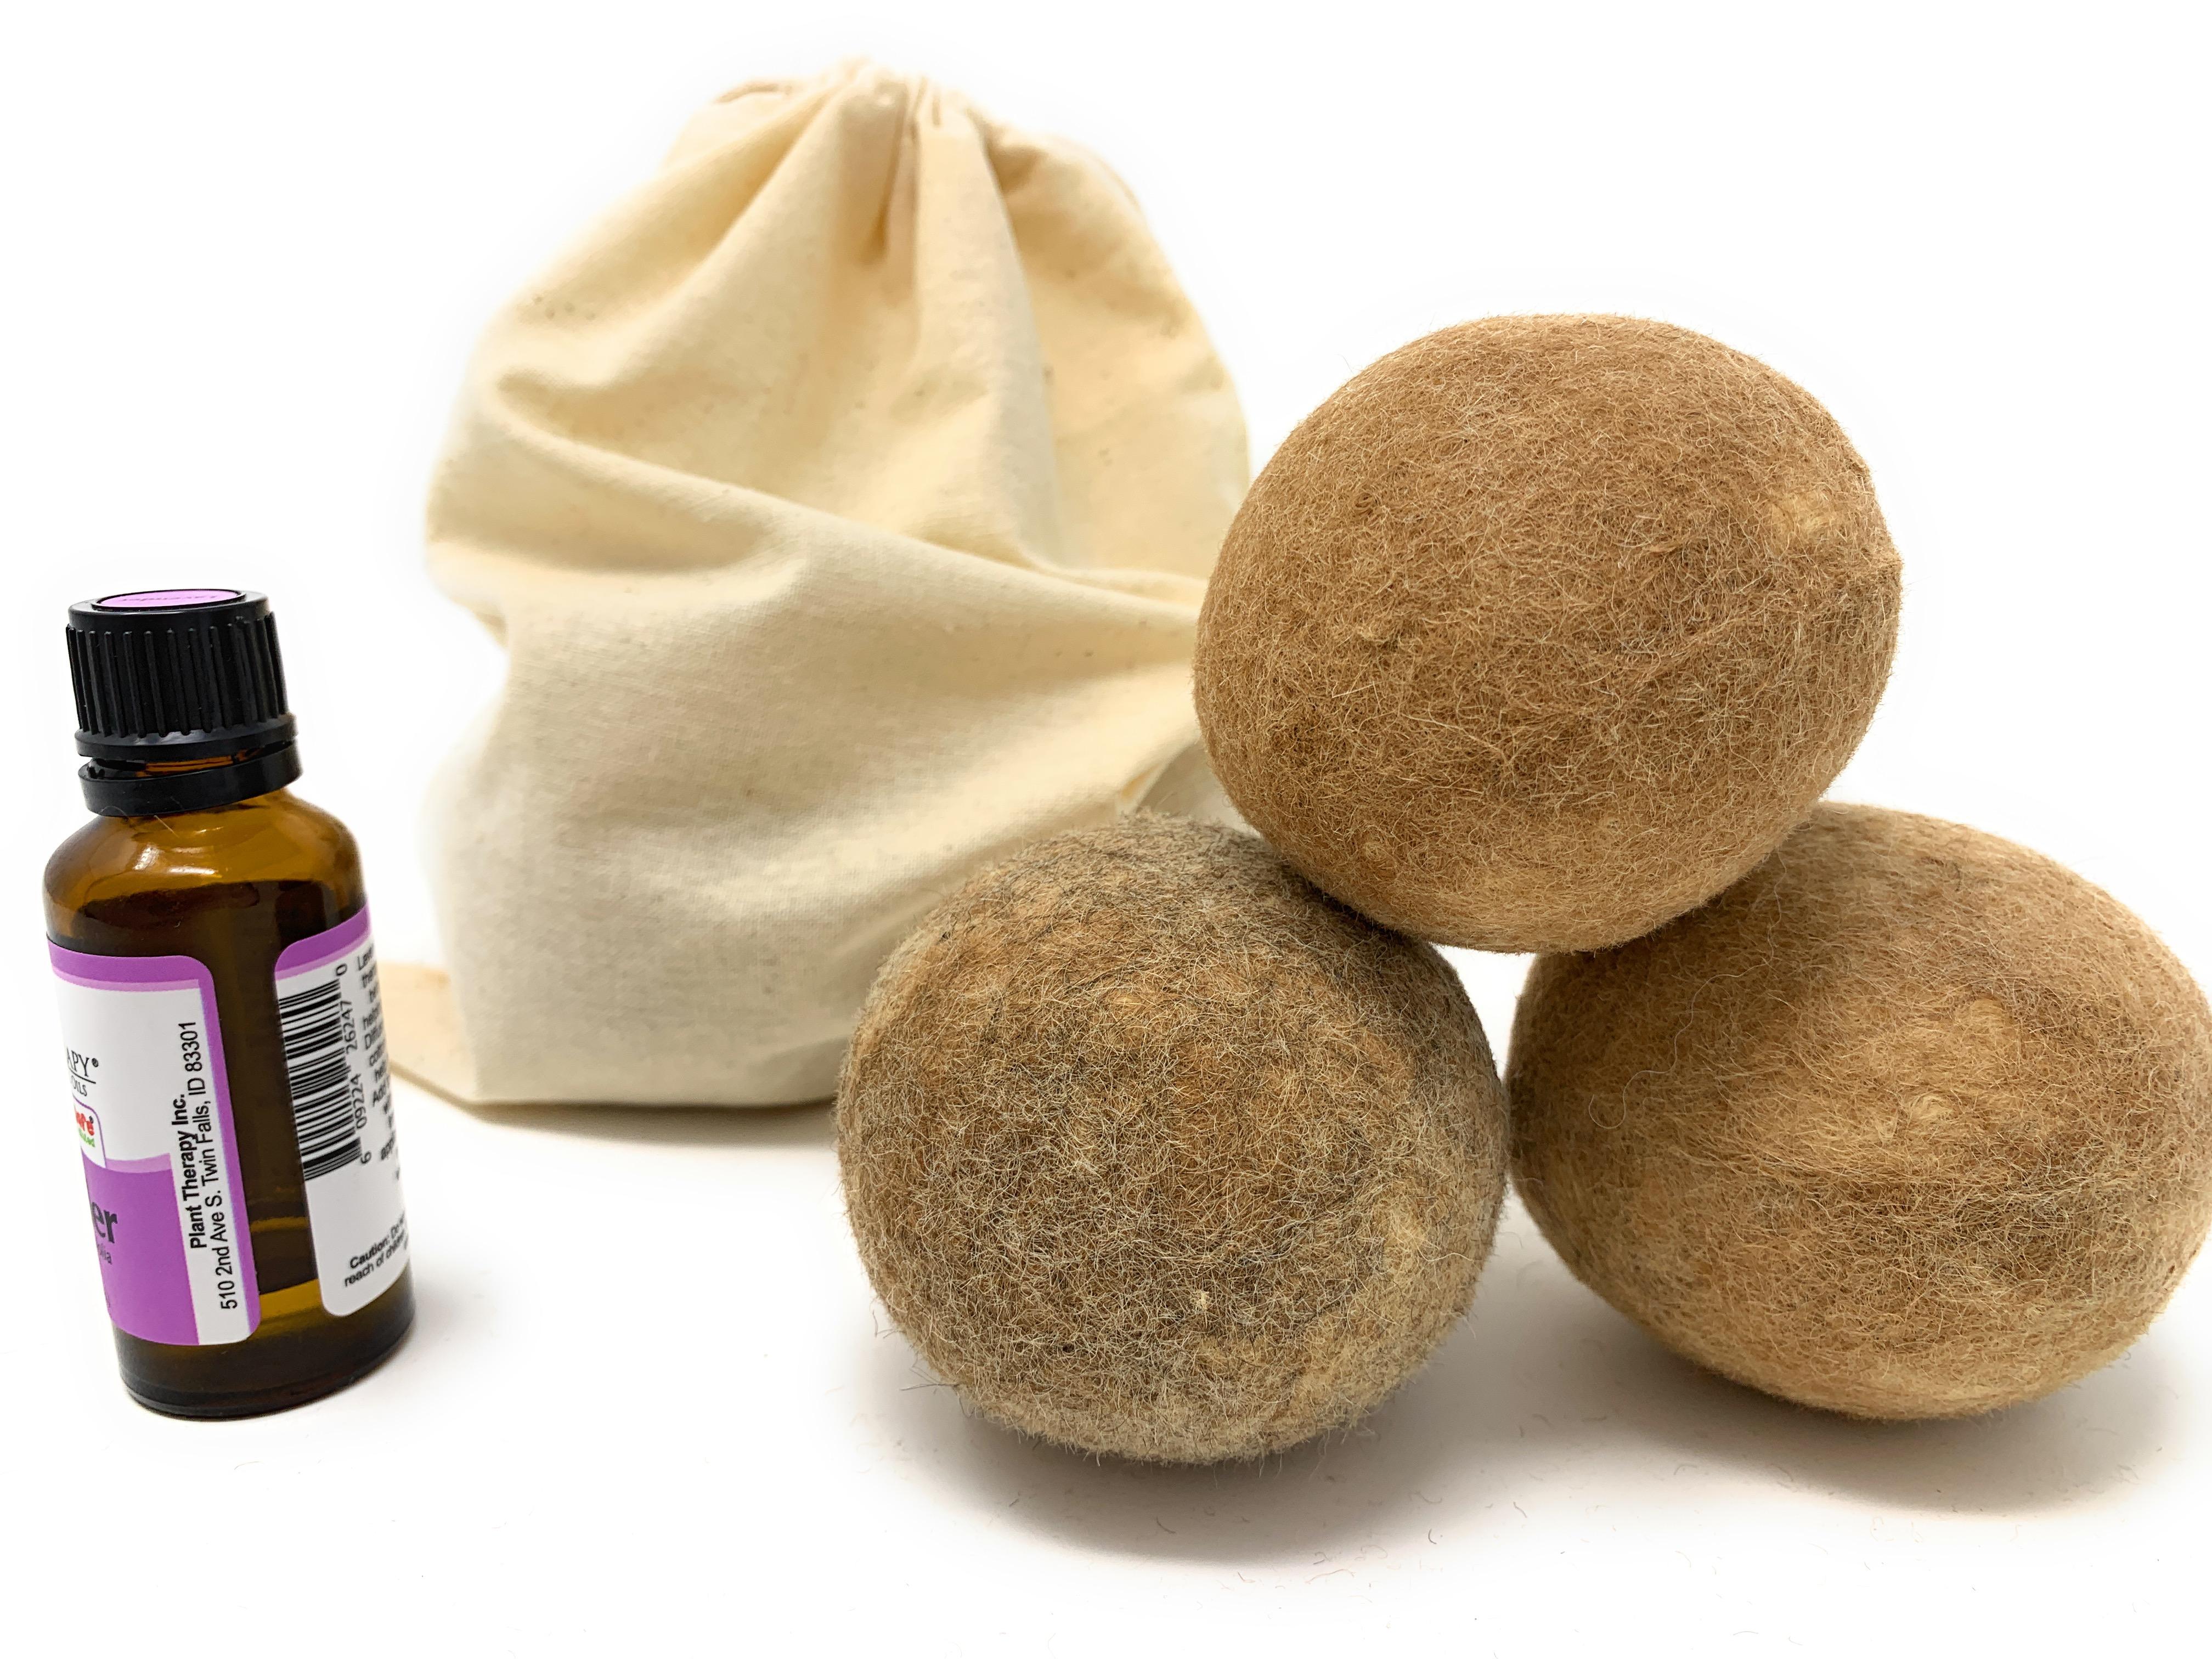 100% Alpaca Wool Dryer Balls - Scent Idea